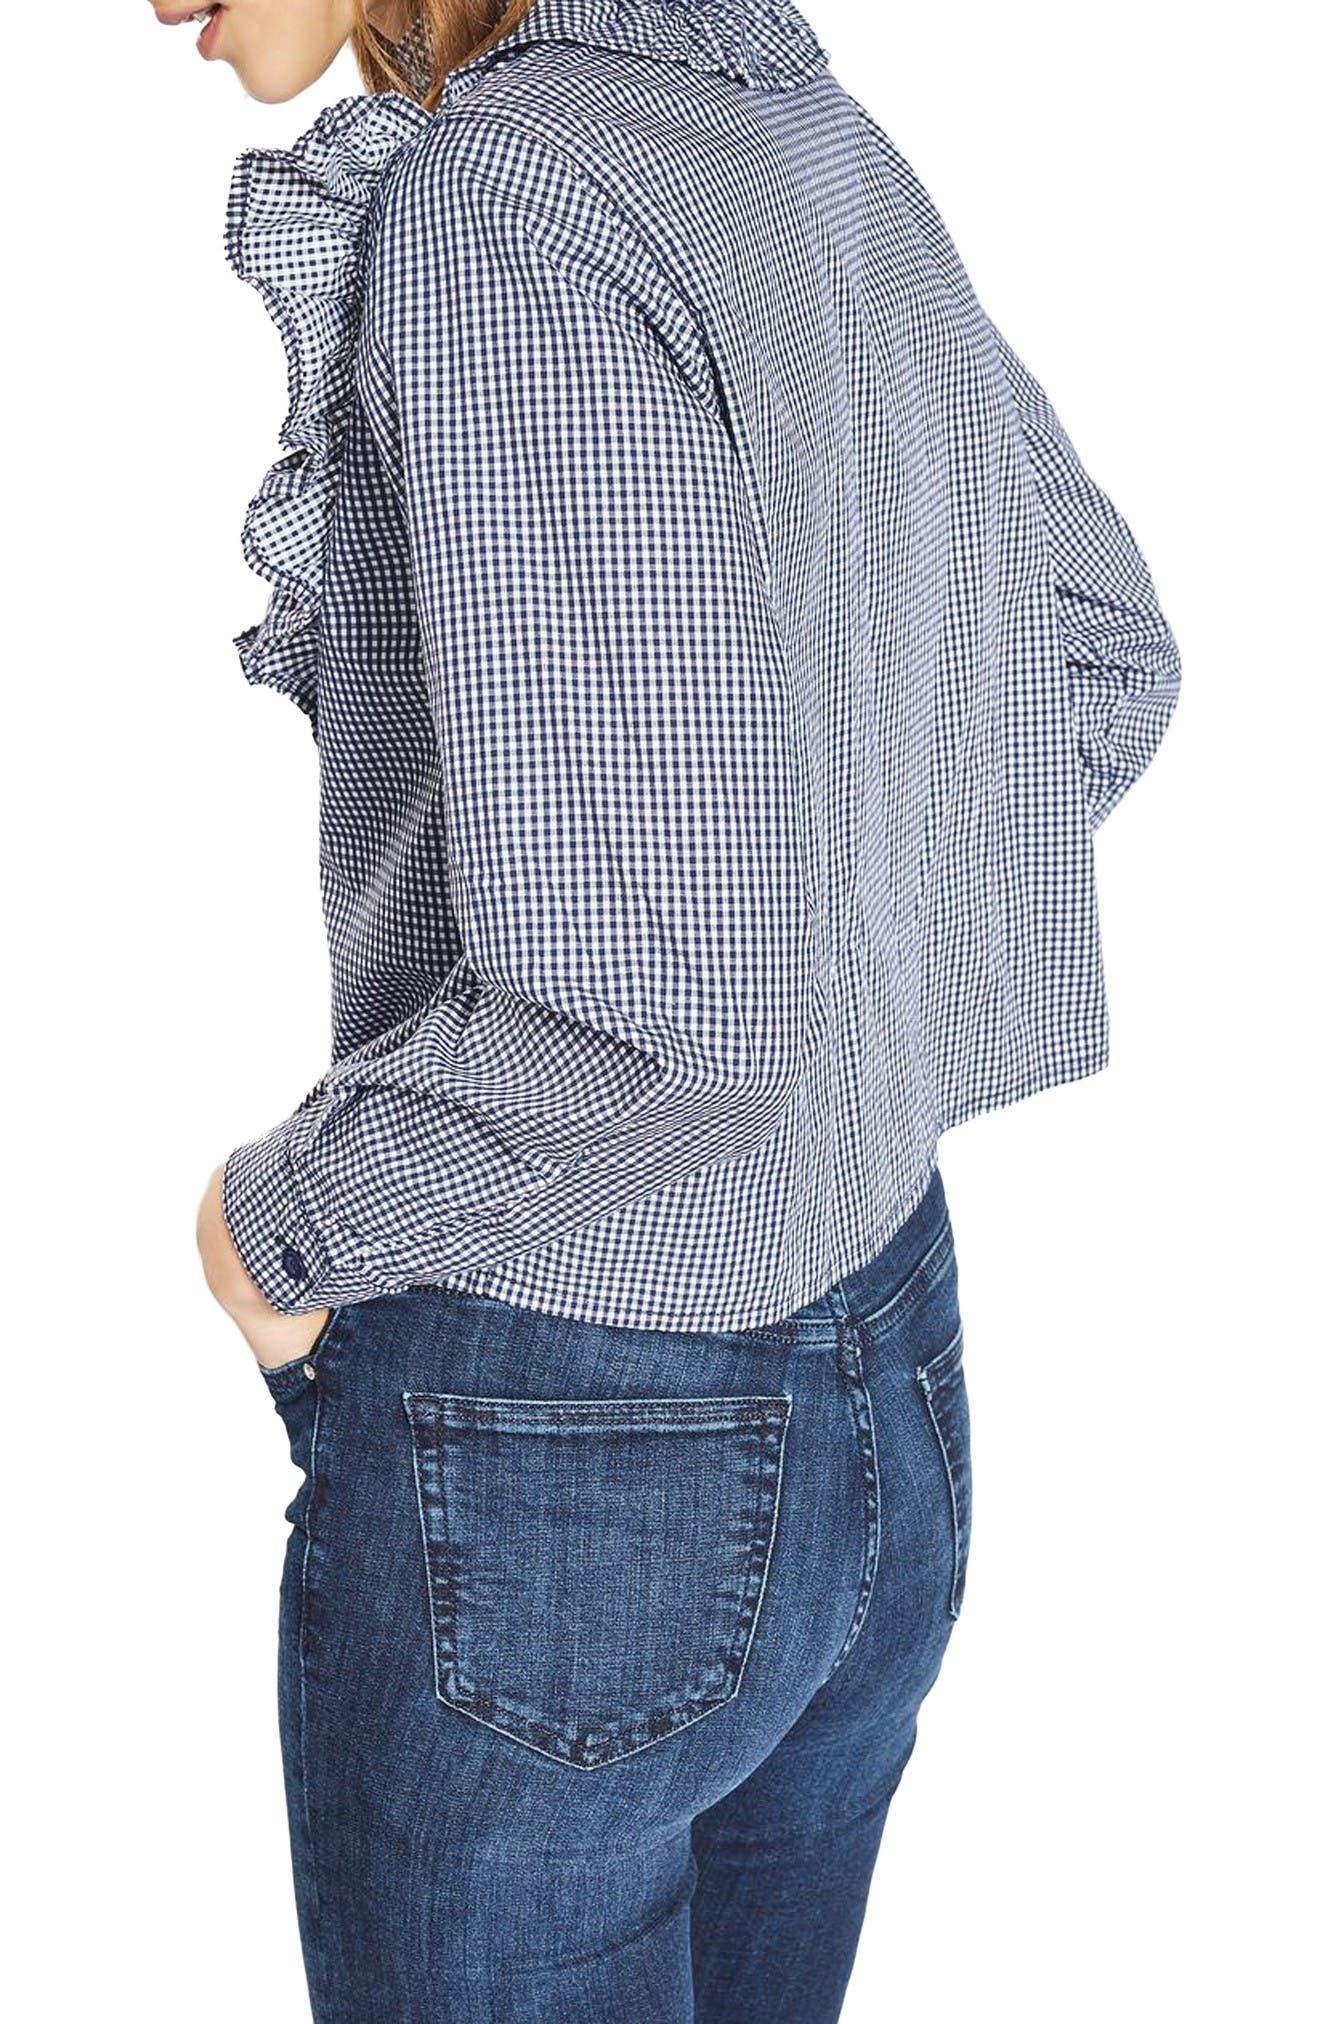 Alternate Image 3  - Topshop Moto Ruffle Gingham Shirt